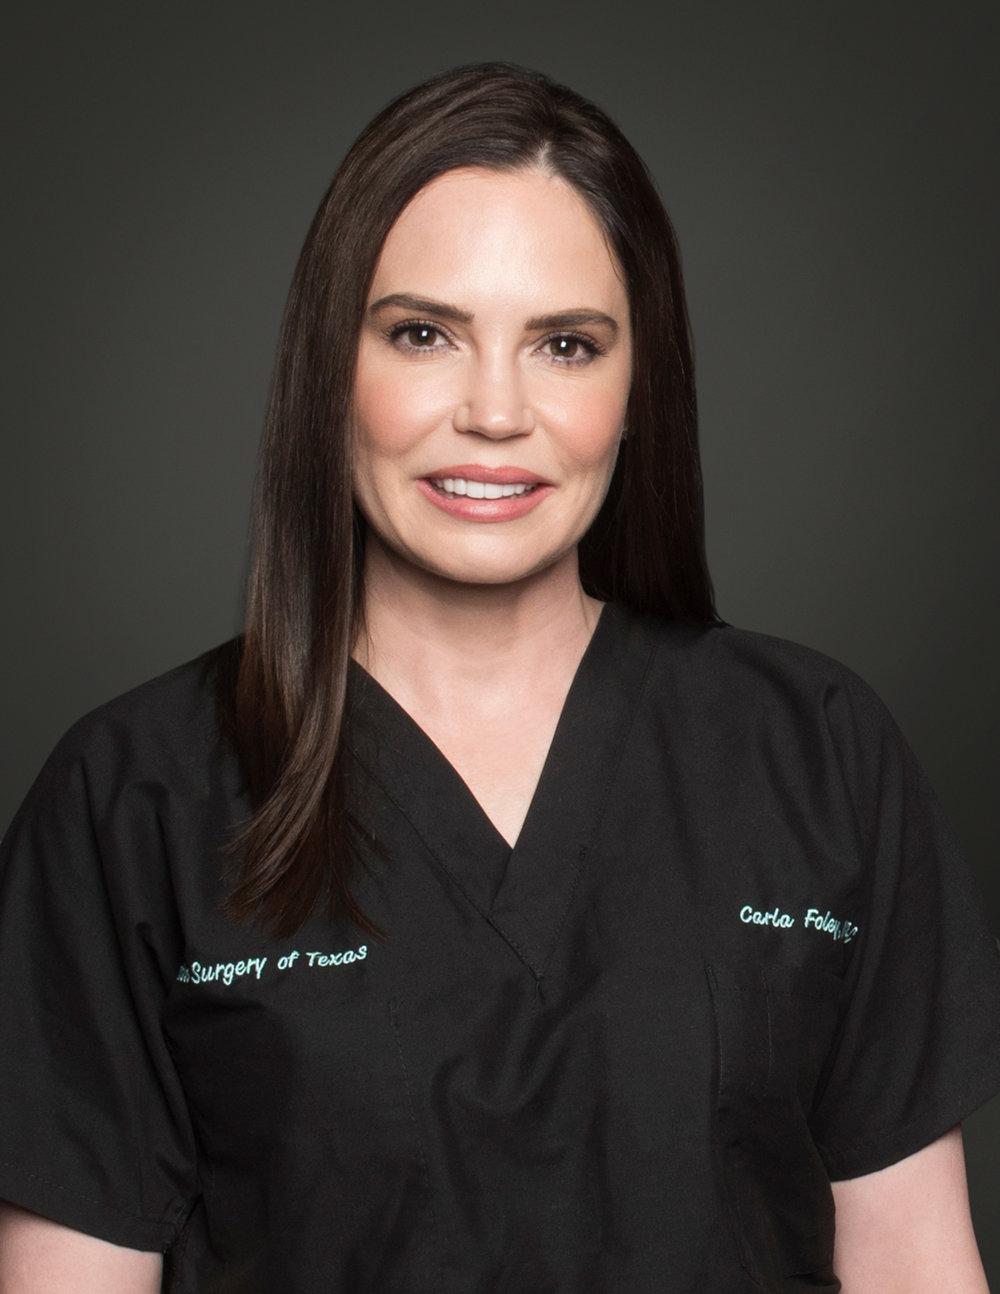 Carla Foley, MSN, NP-C